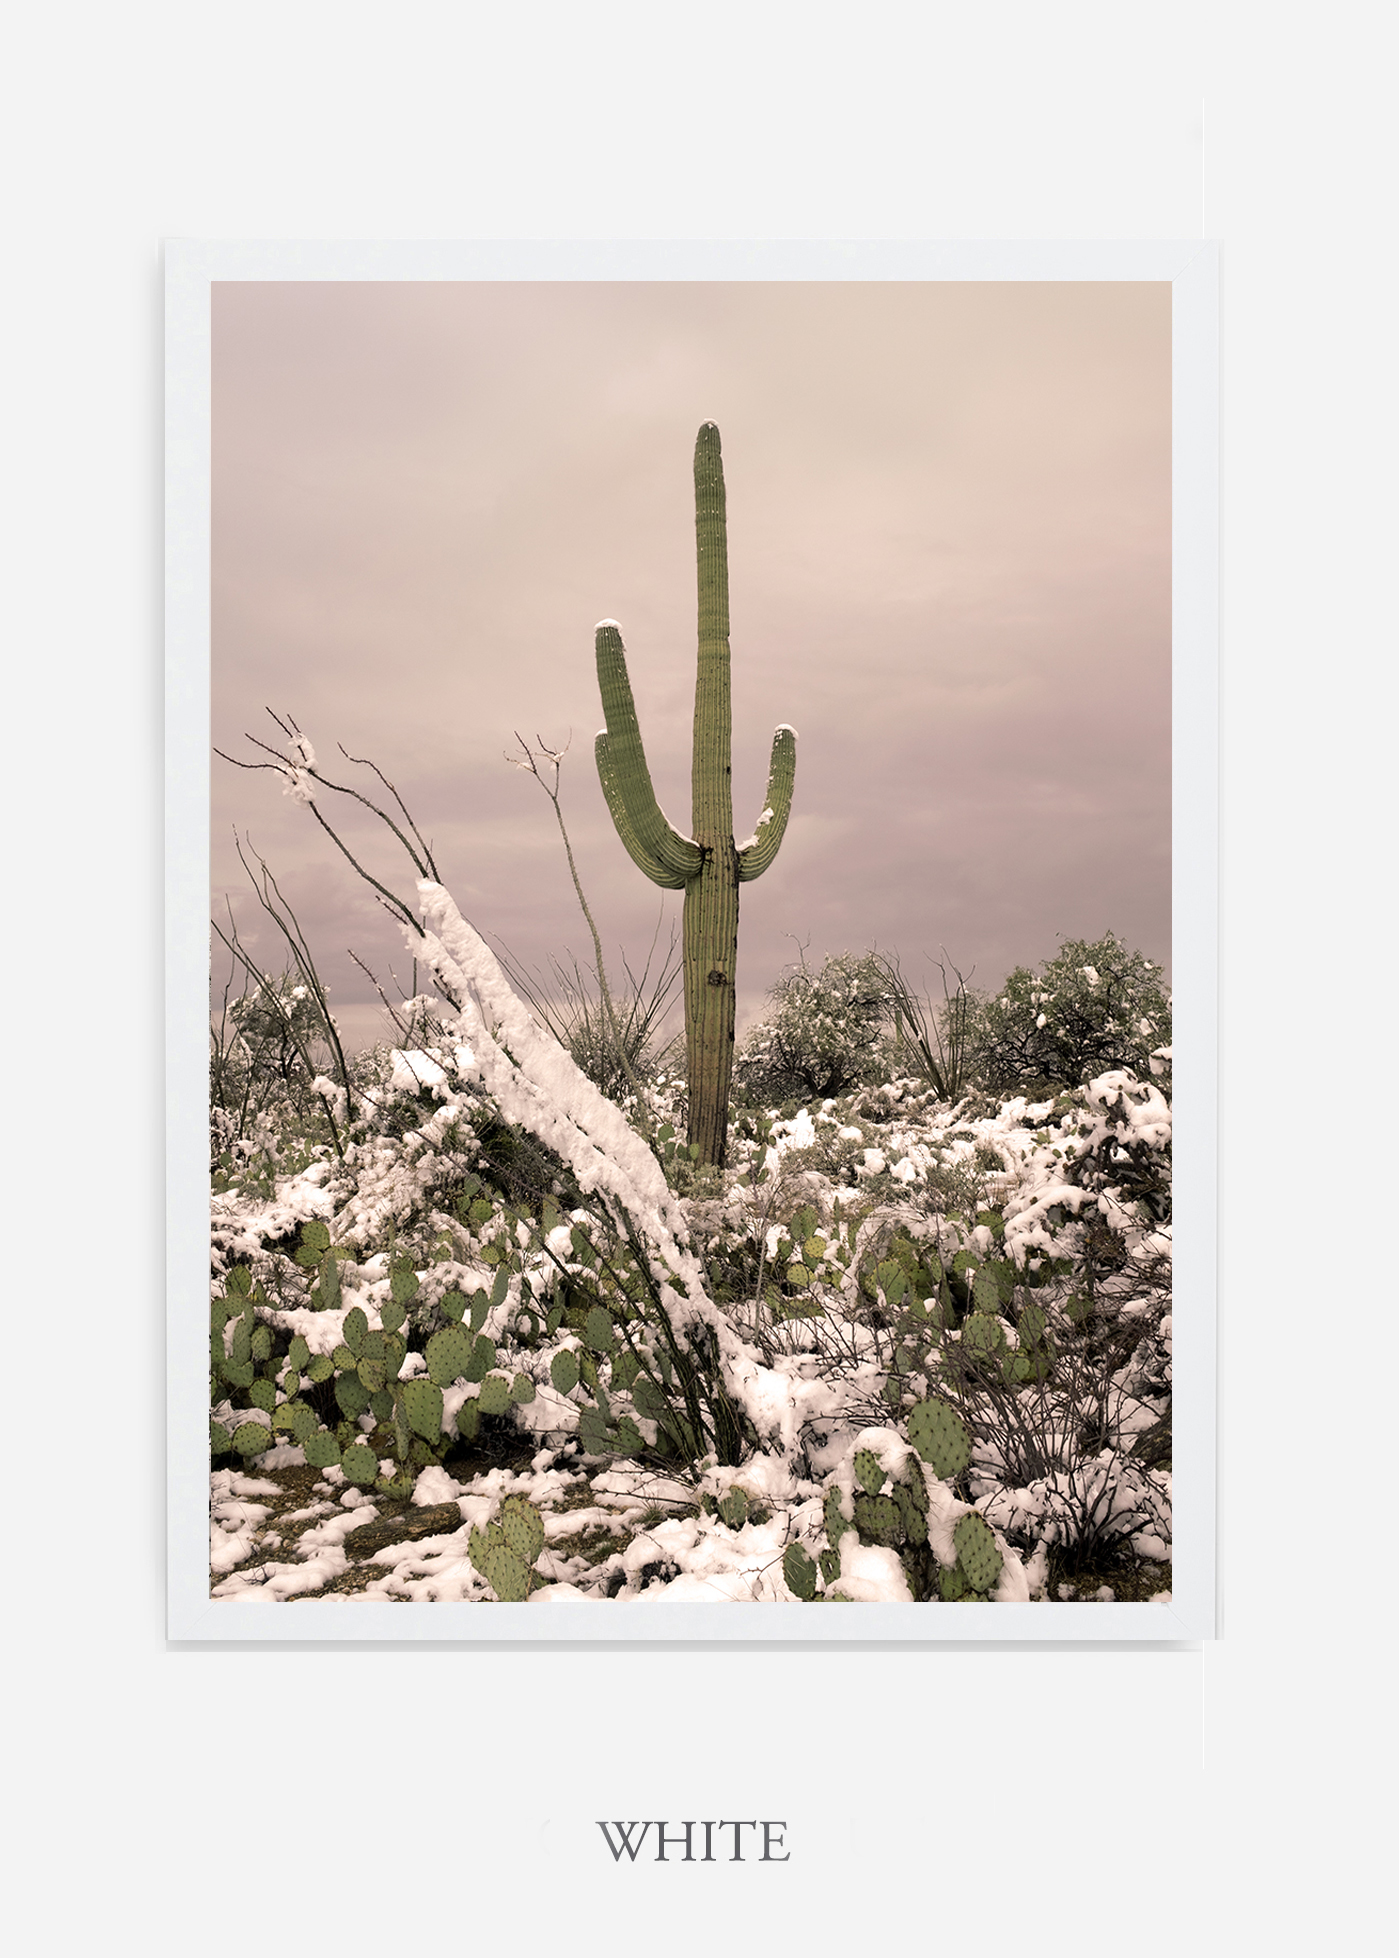 nomat-whiteframe-saguaroNo.4-wildercalifornia-art-wallart-cactusprint-homedecor-prints-arizona-botanical-artwork-interiordesign.jpg